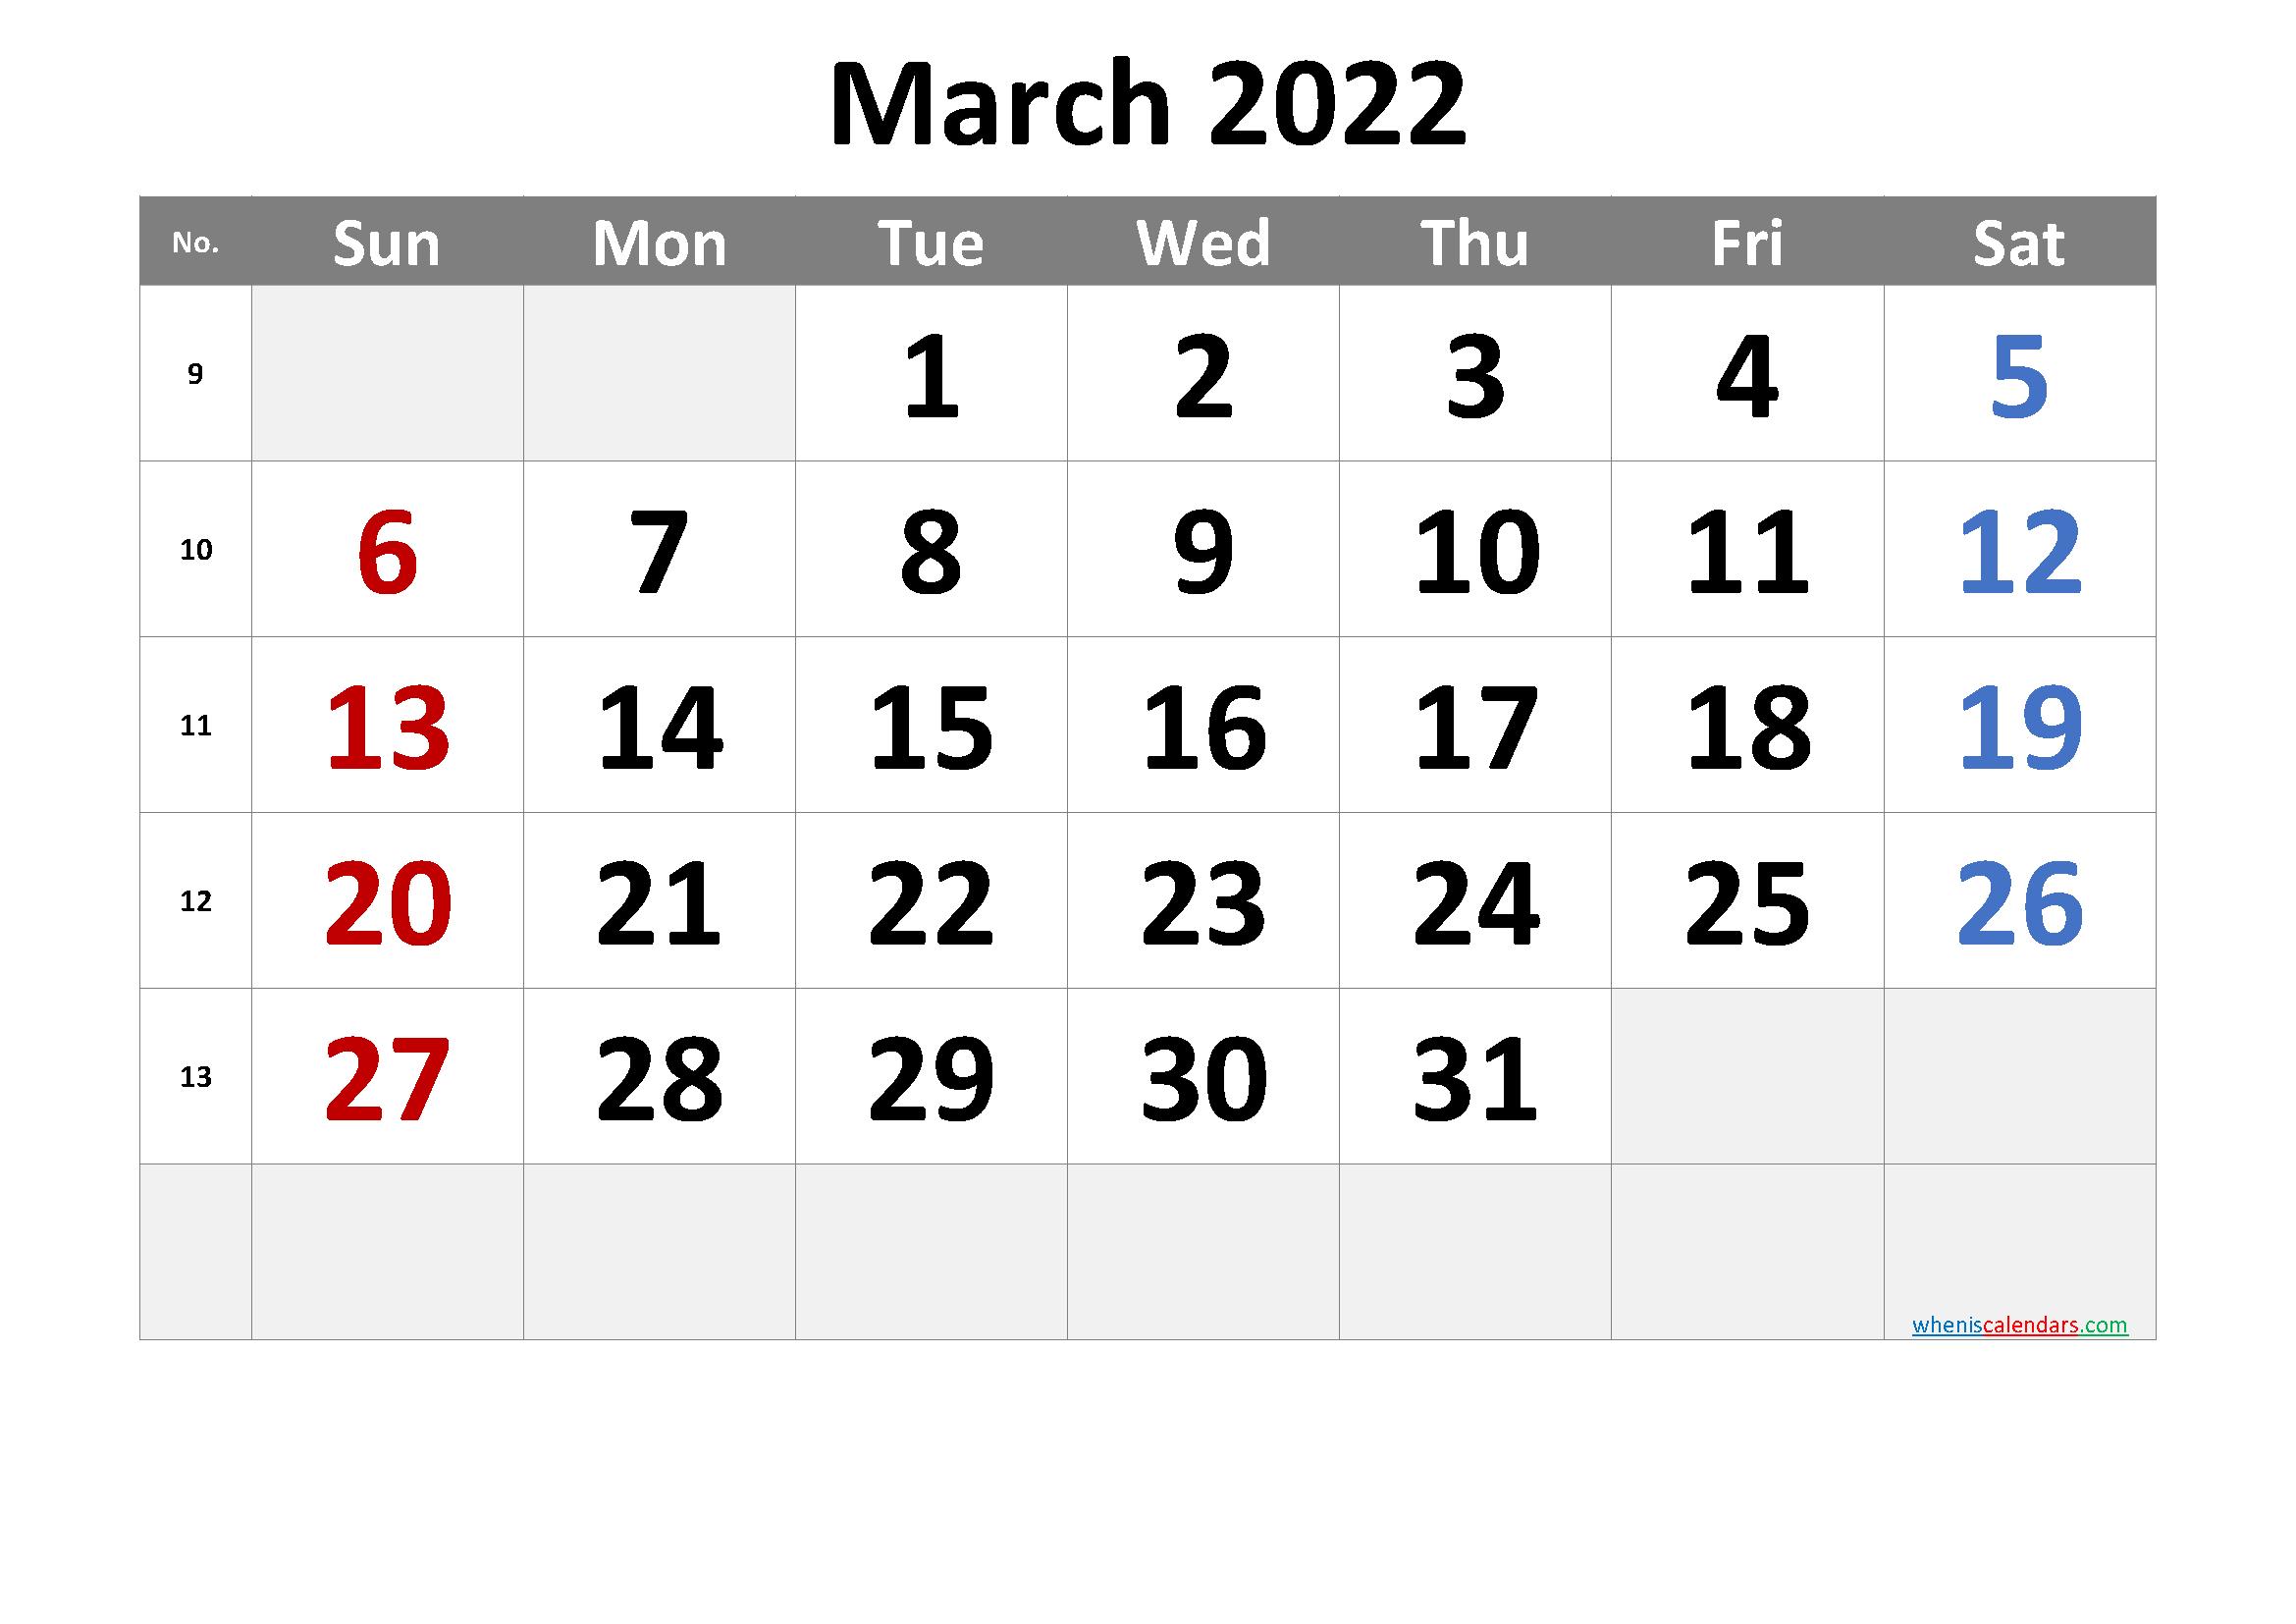 March 2022 Printable Calendar [Free Premium] for March 2022 Calendar Printable